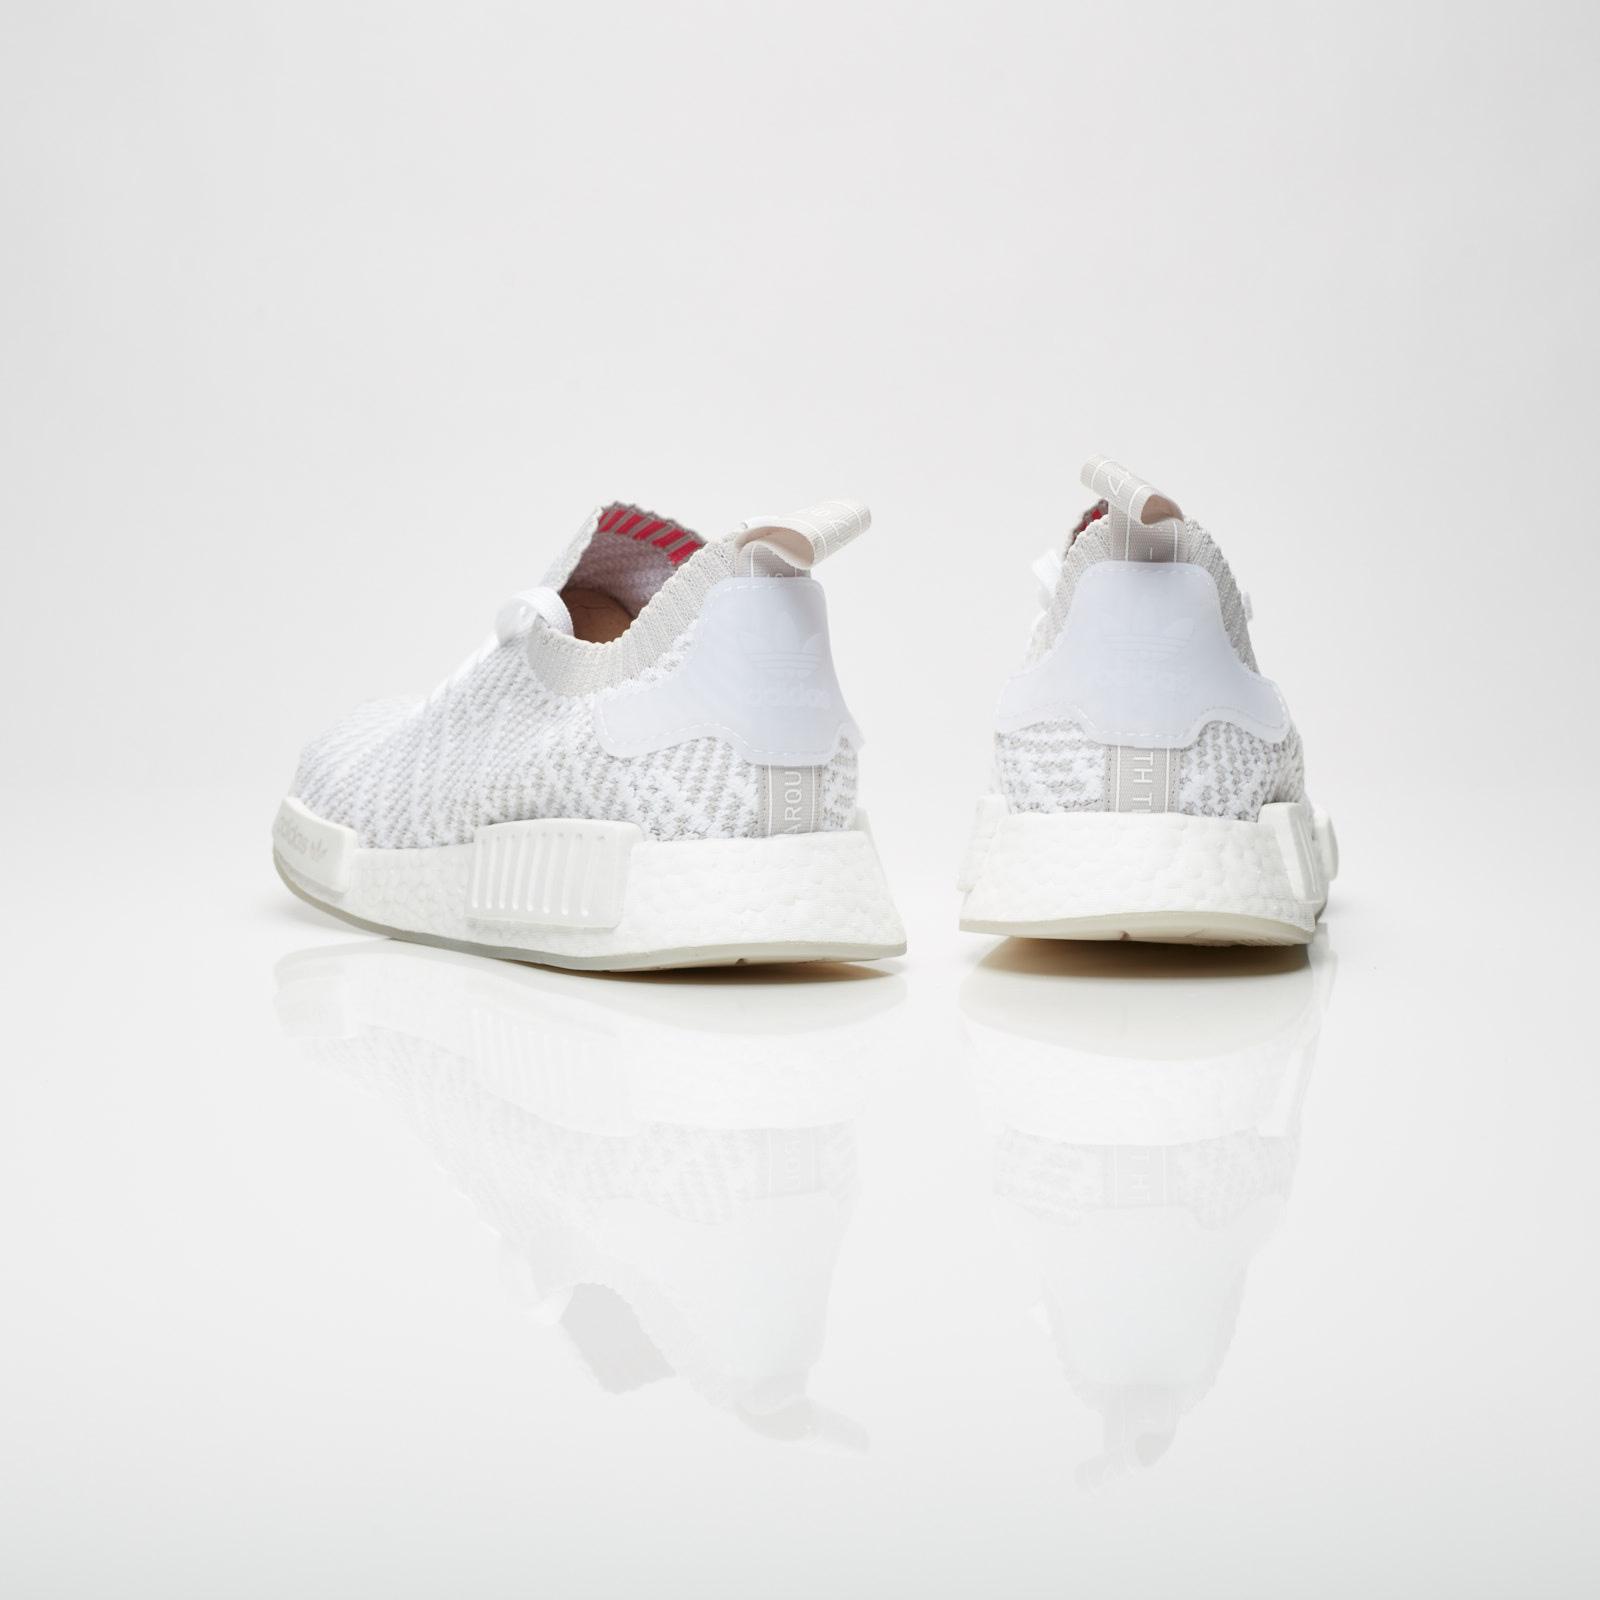 486ce9b6af3d4 adidas NMD R1 Stlt PK - Cq2390 - Sneakersnstuff